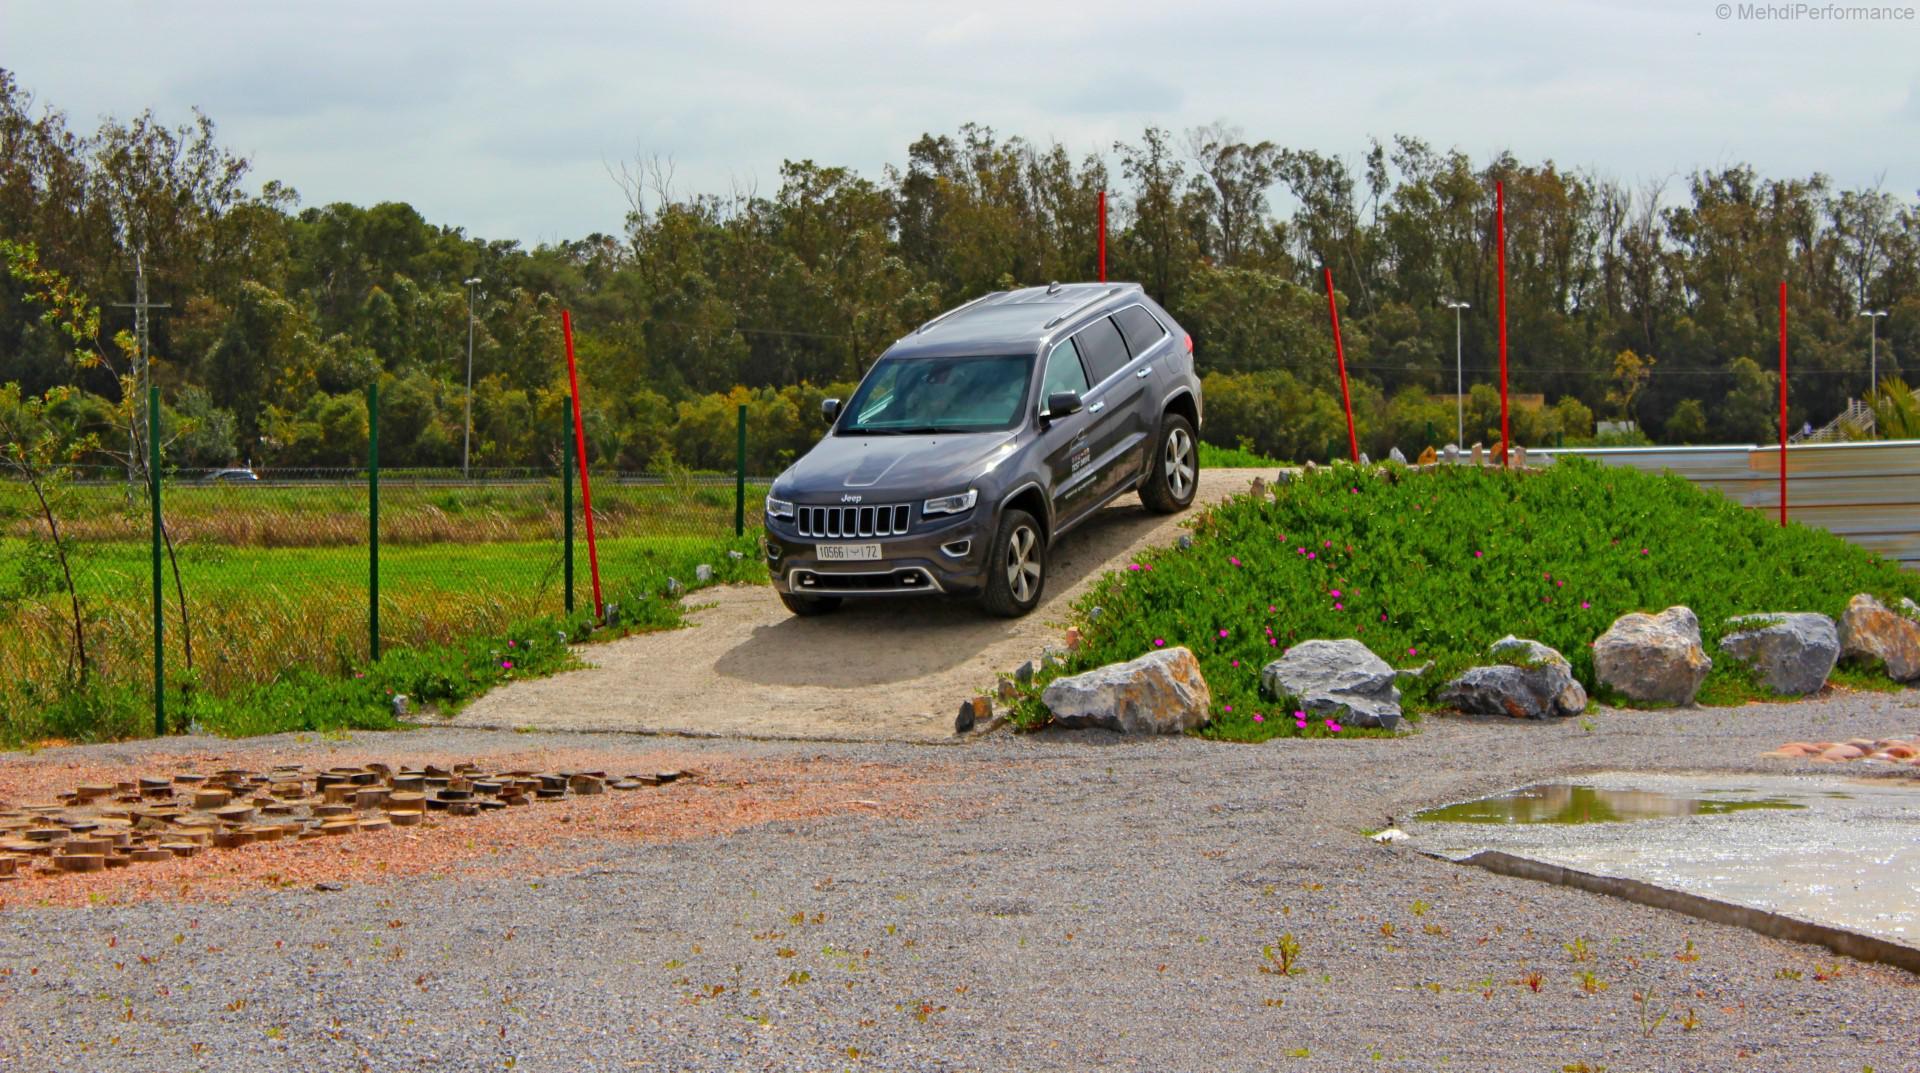 jeep-territory-le-nouveau-terrain-de-jeu-by-motor-village-716-6.jpg